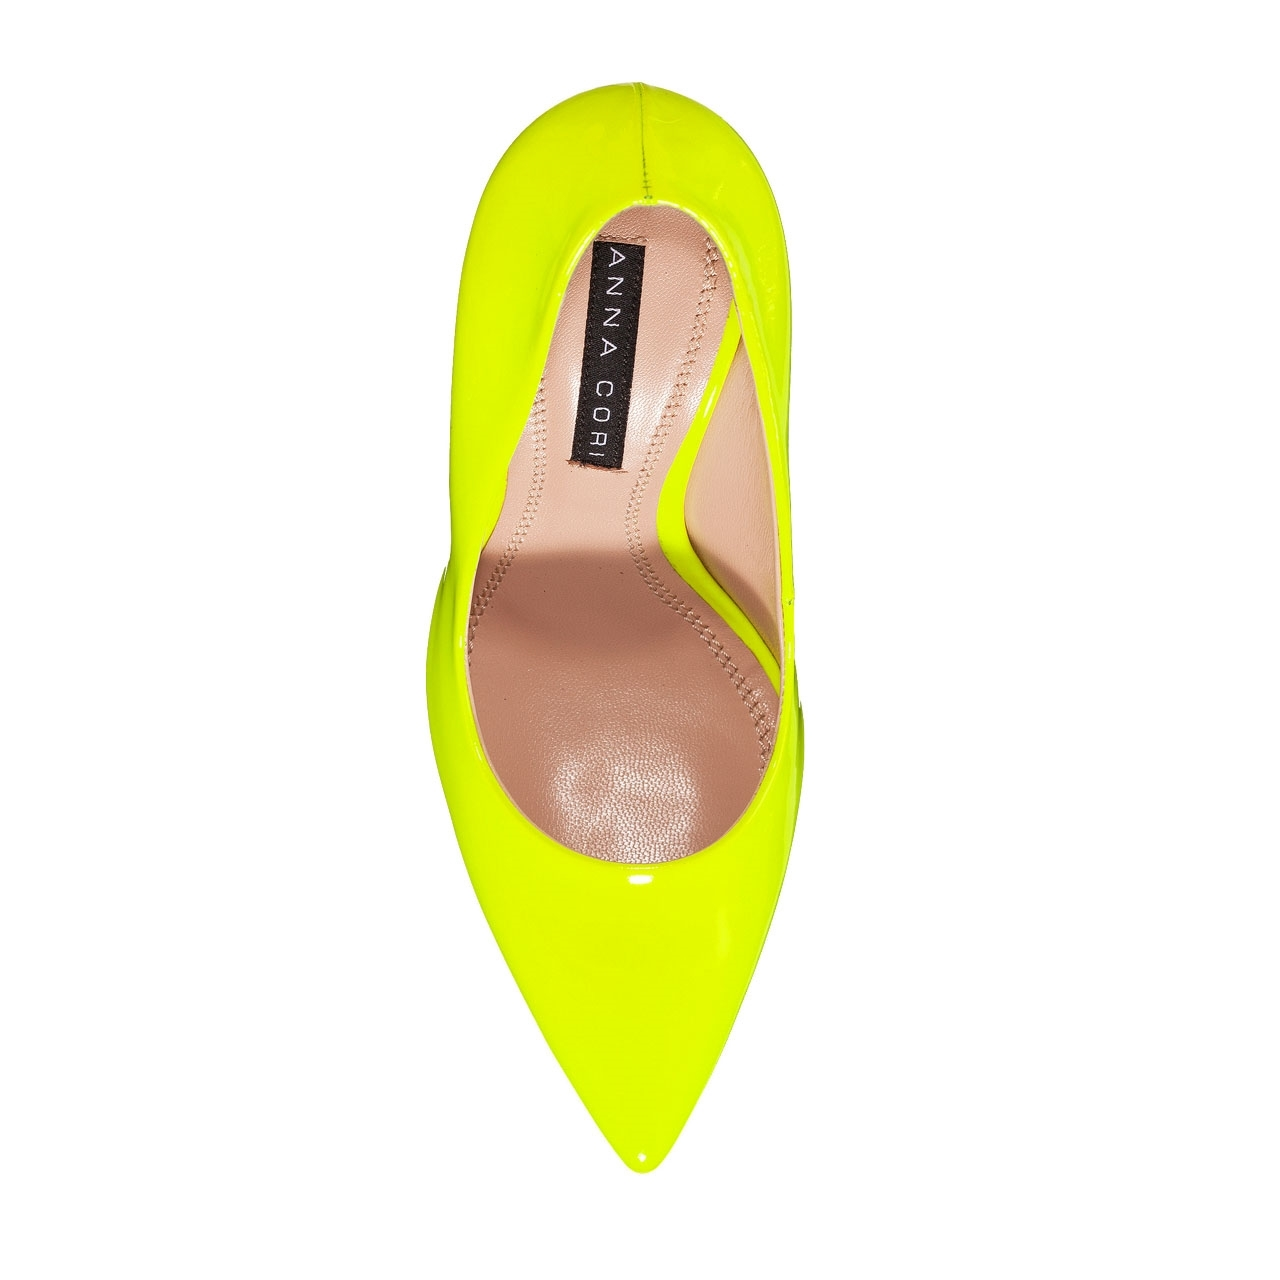 Imagine Pantofi Eleganti Dama 4532 Vernice Fluo Giallo